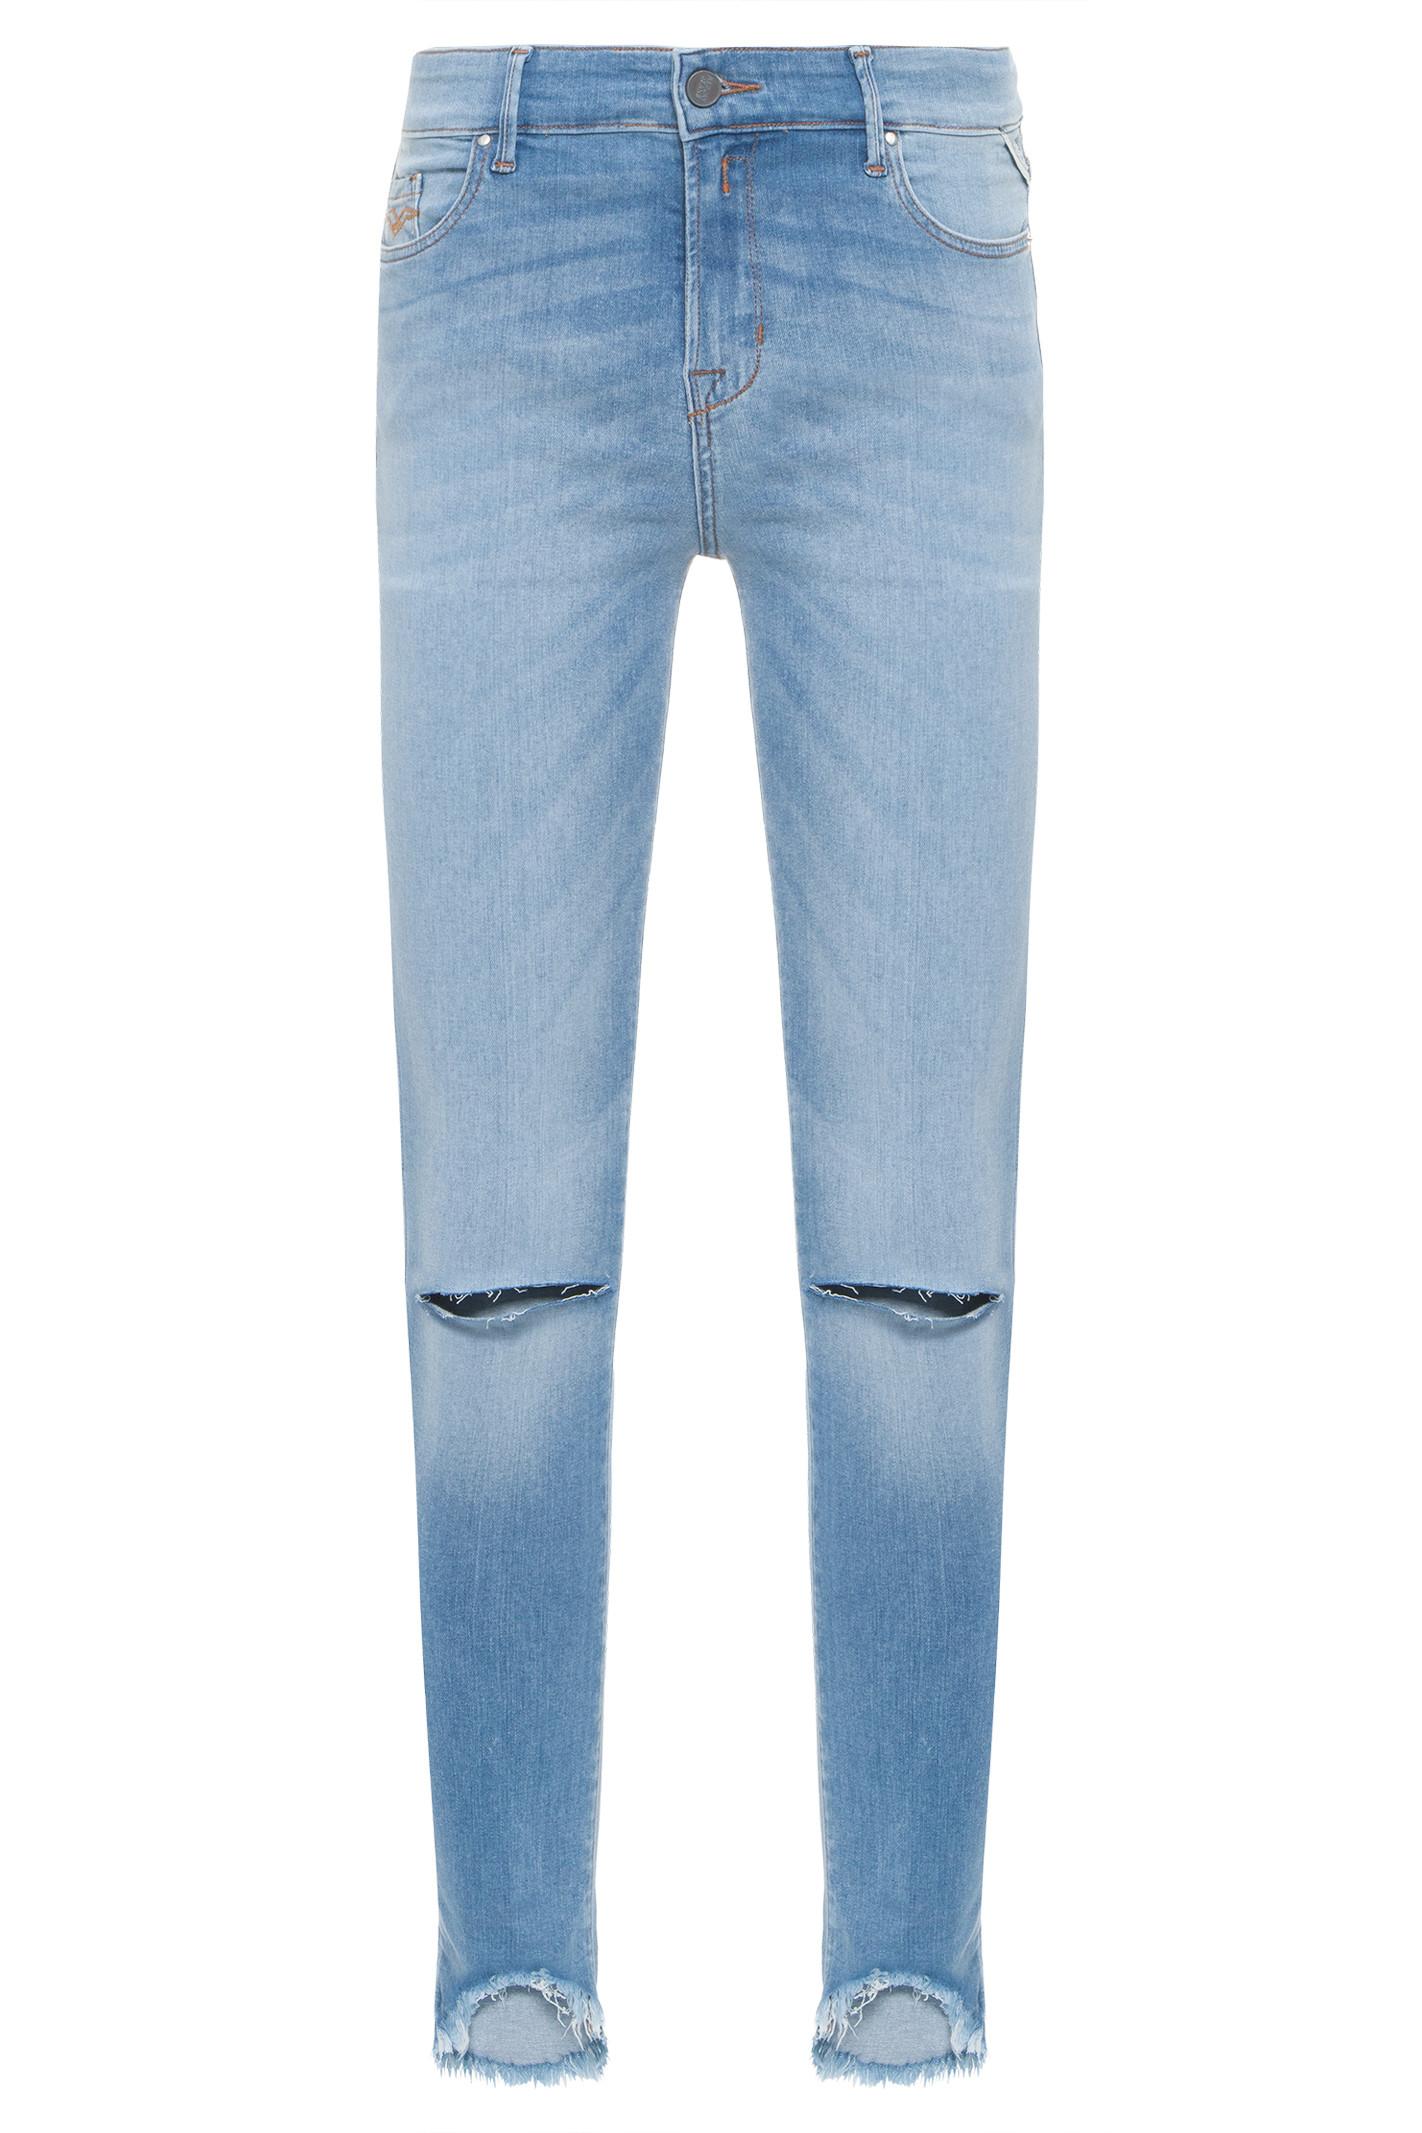 Calça Jeans Luz Skinny - Azul